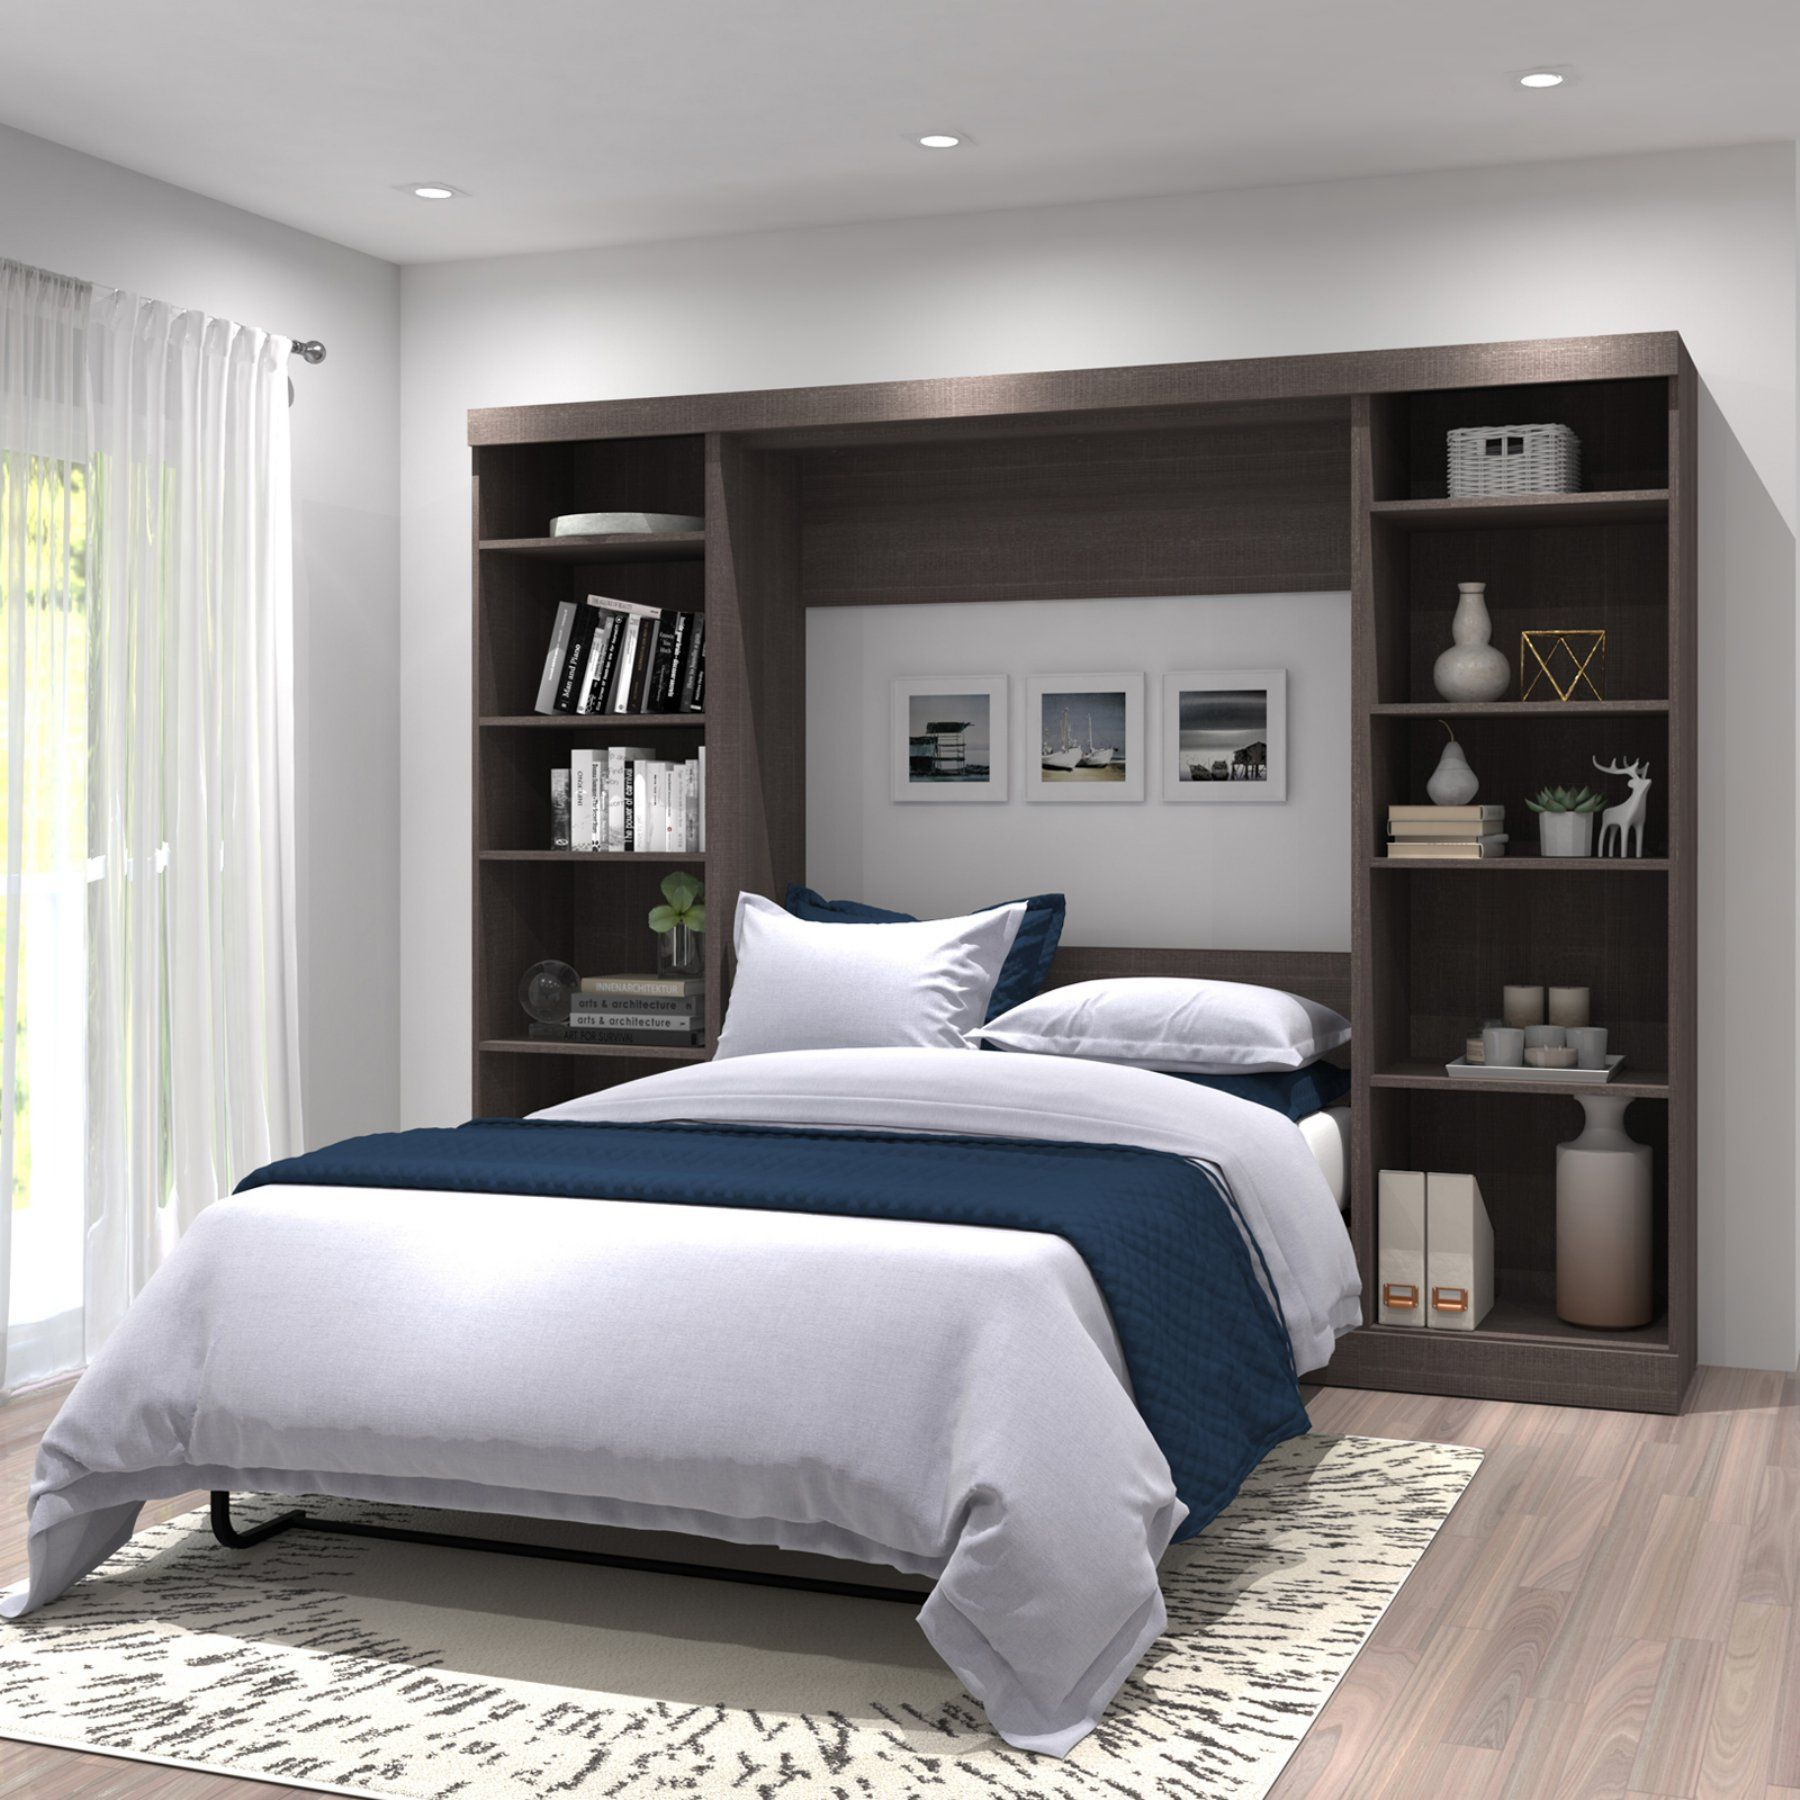 Bestar Pur V Storage Unit Murphy Wall Bed 26893 47 Remodel Bedroom Small Room Bedroom Small Bedroom